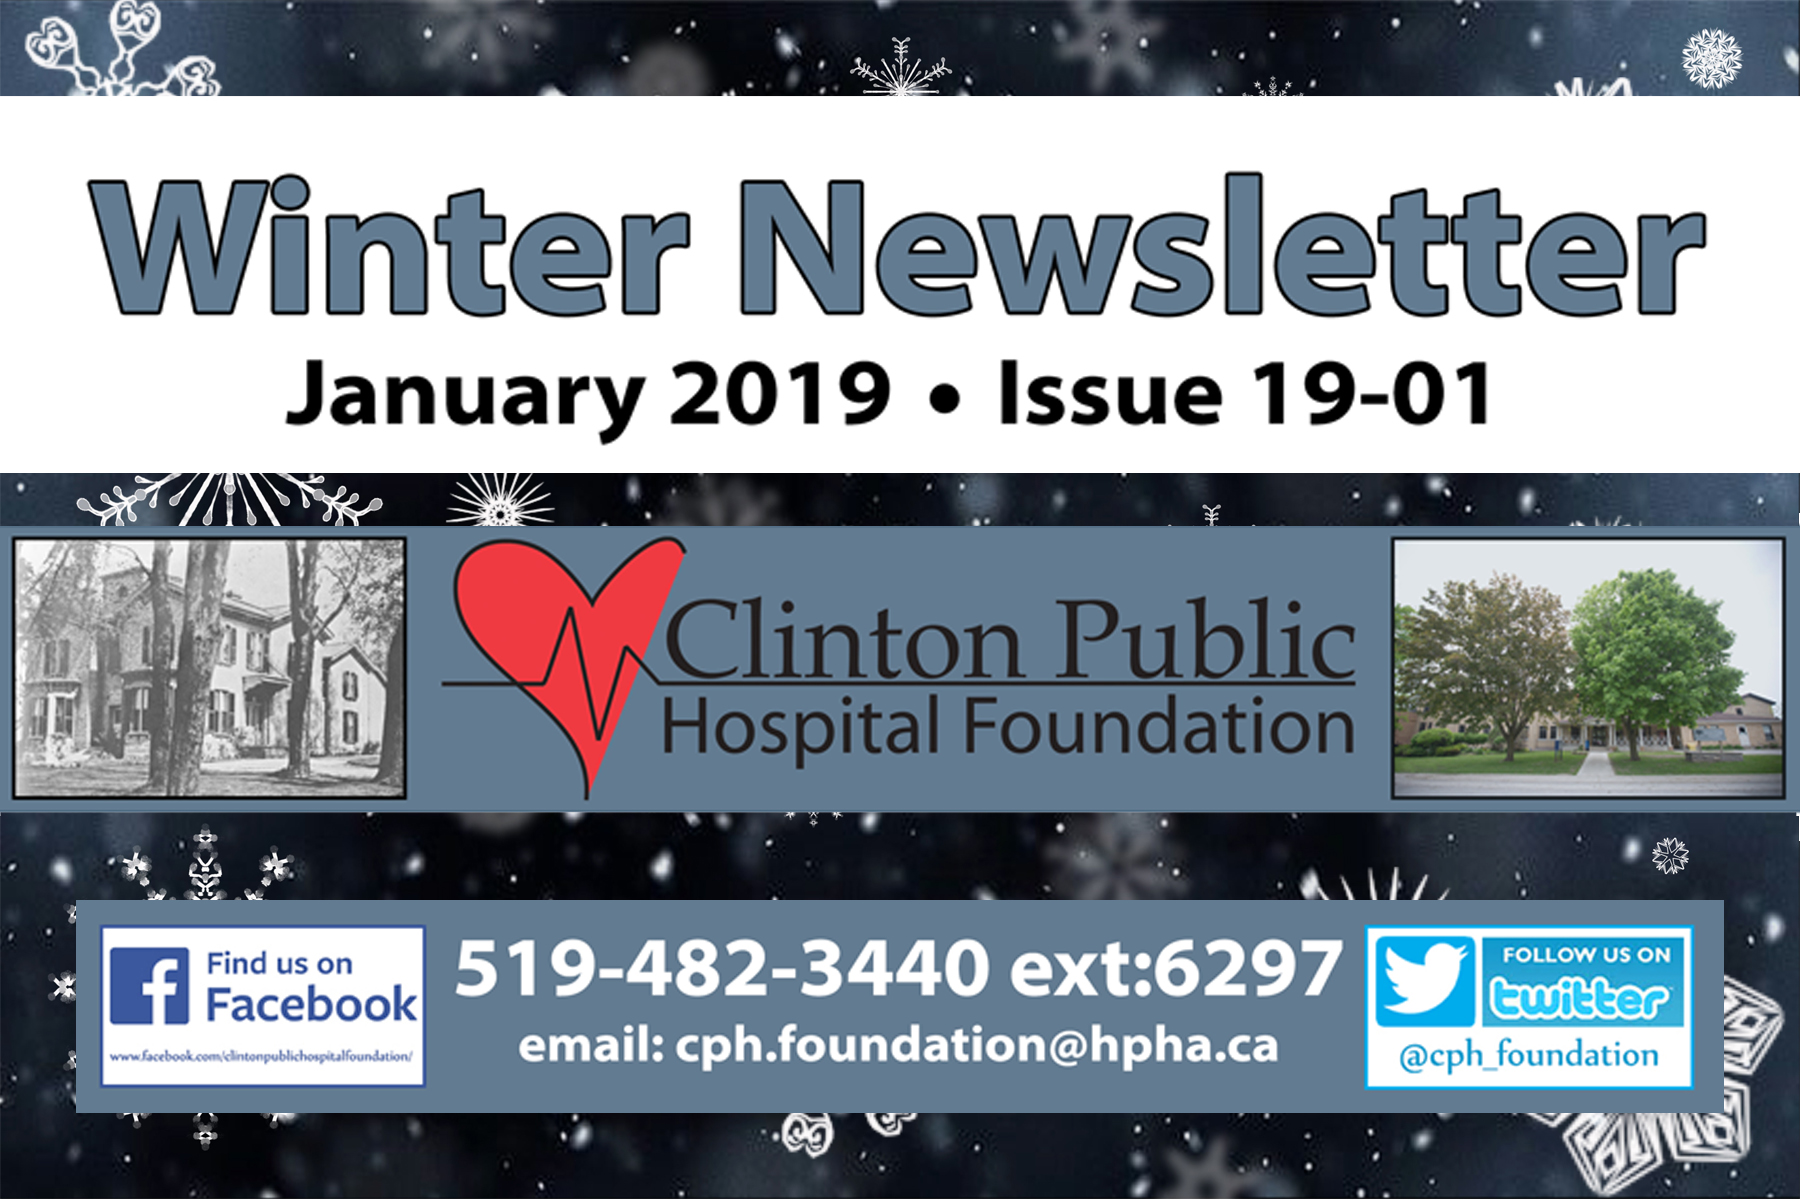 CPHF Winter Newsletter (19-01)